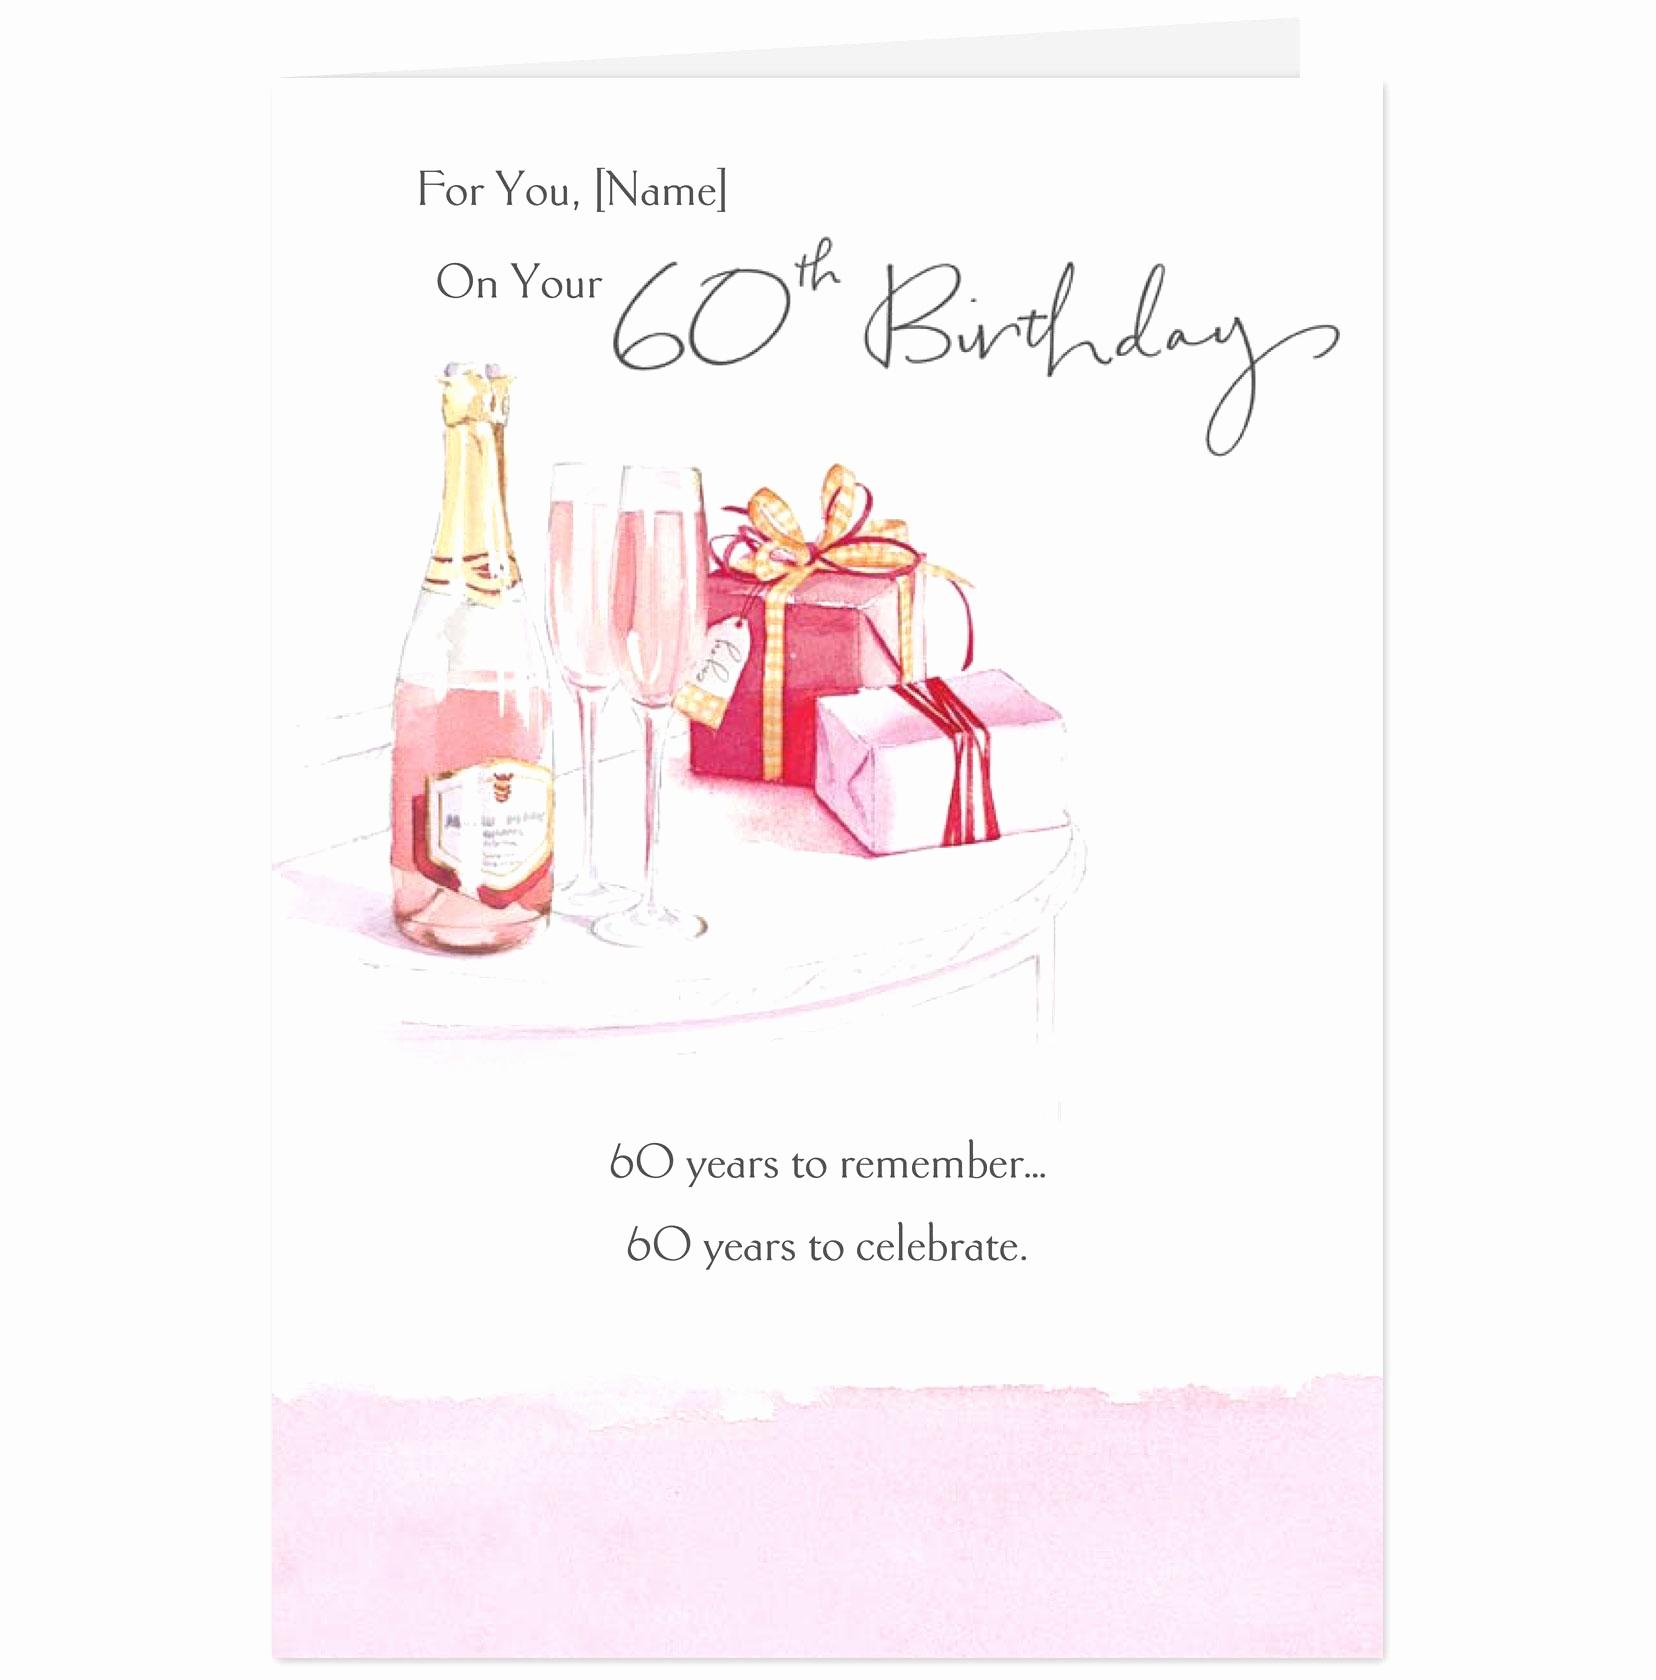 Free Printable Hallmark Birthday Cards – Rtrs.online - Free Printable Greeting Cards Hallmark